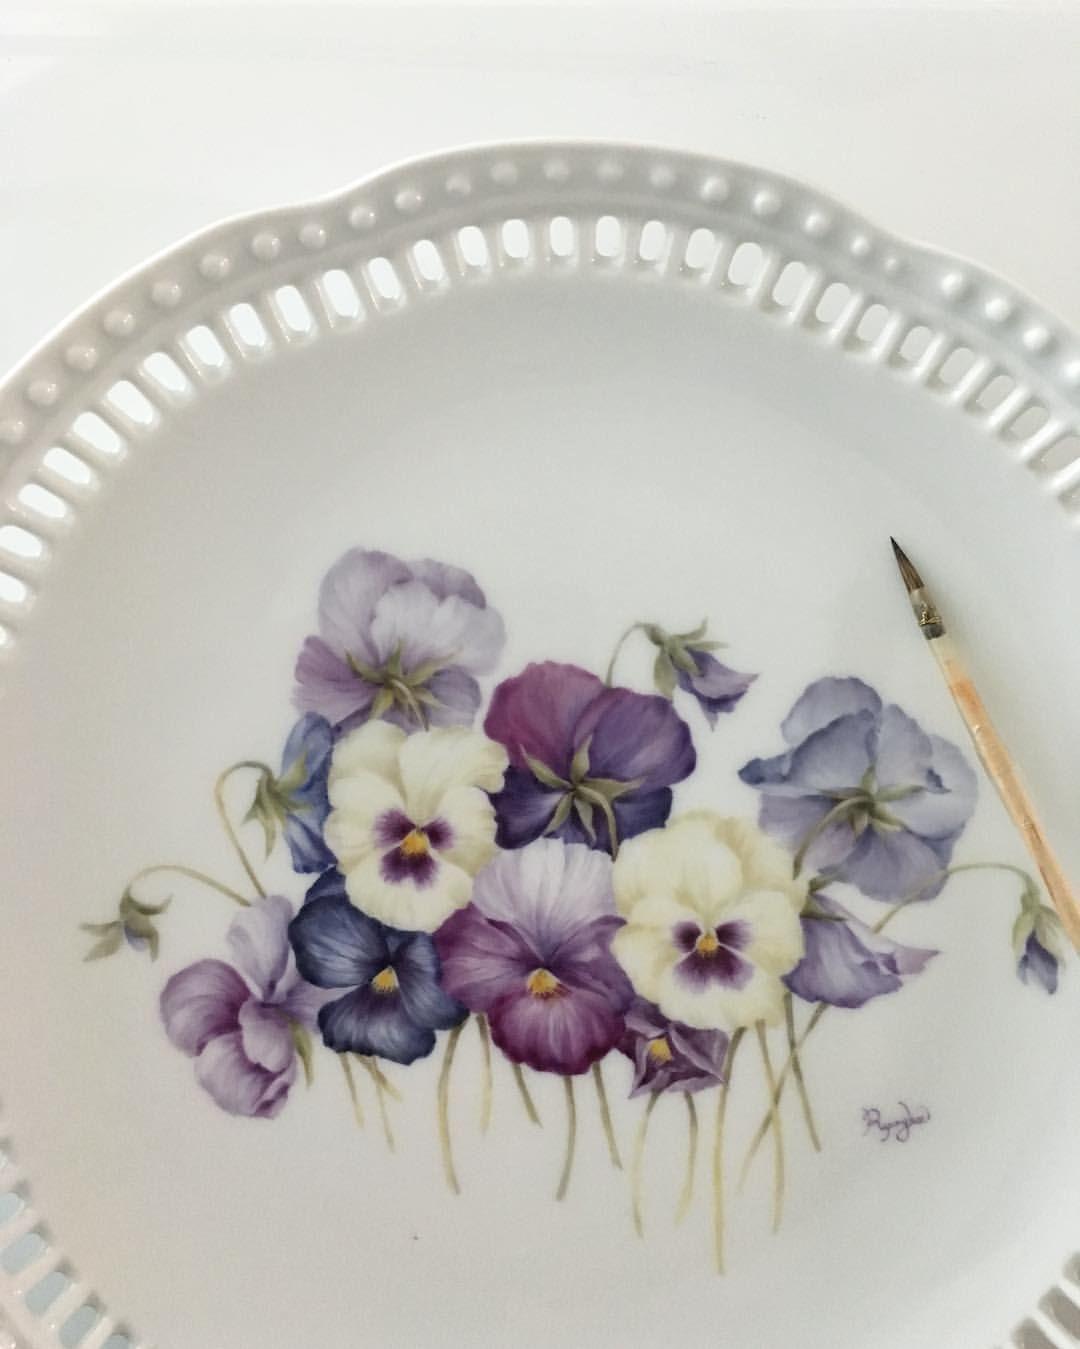 Porcelainpainting Handpainted Porcelain Artwork